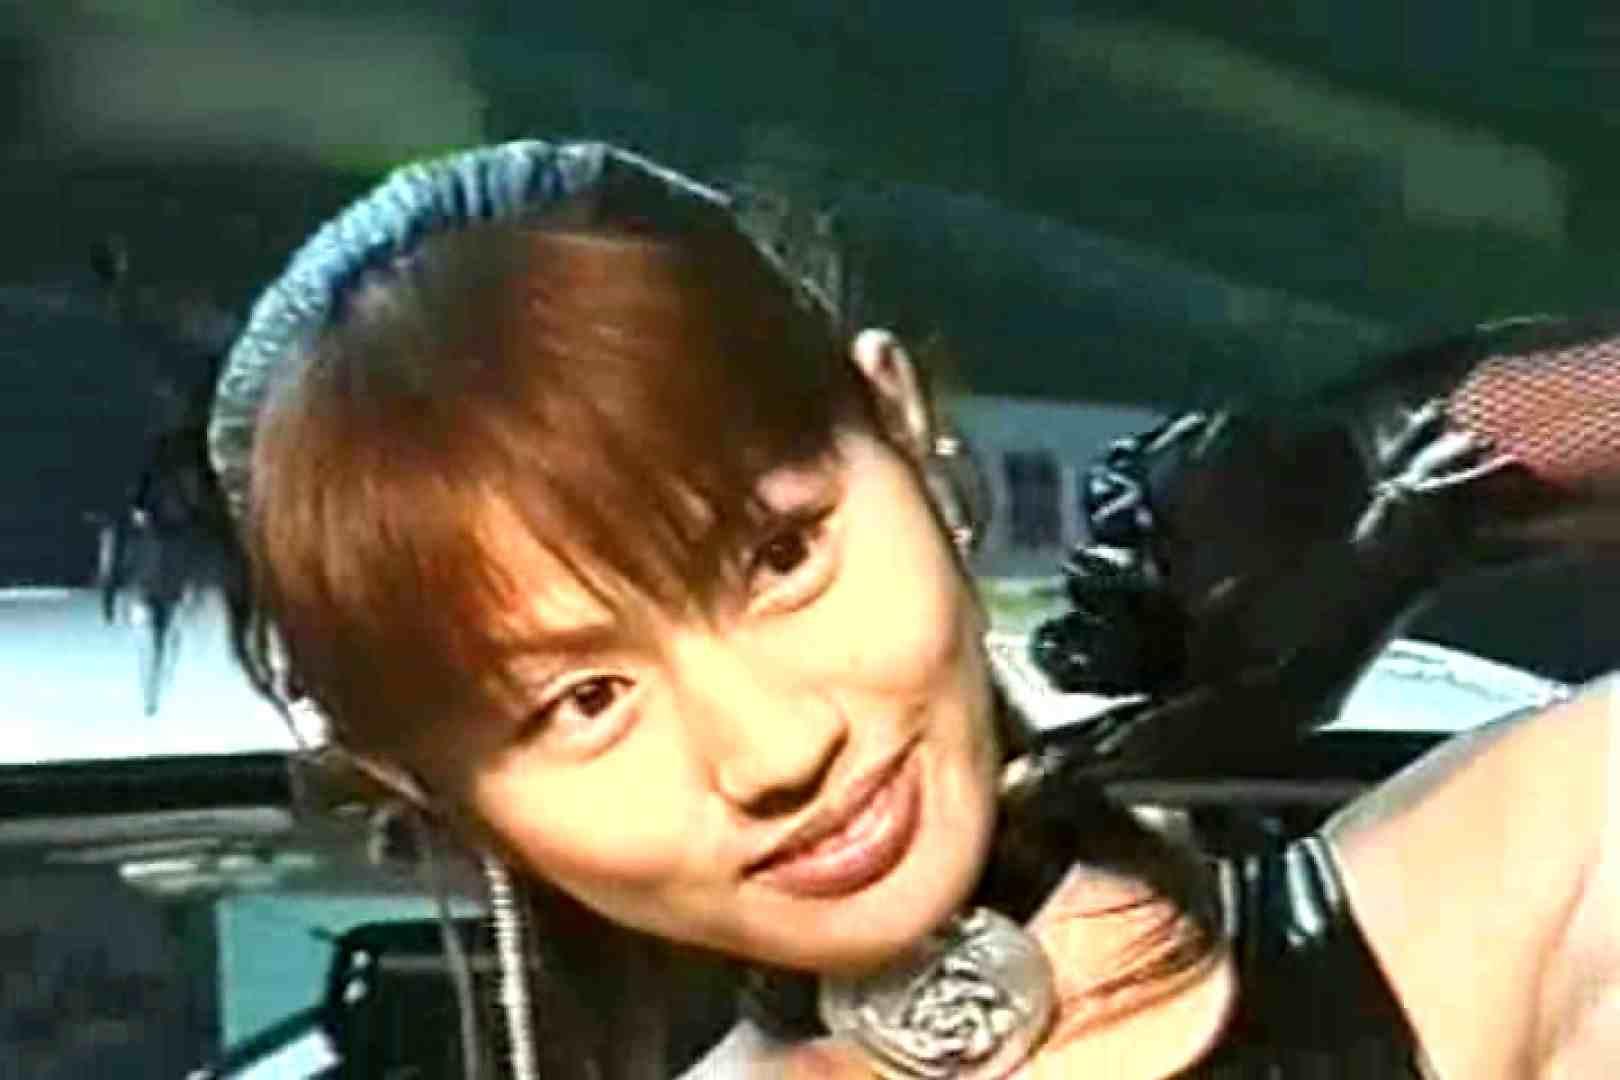 RQカメラ地獄Vol.24 お姉さん丸裸  95pic 78